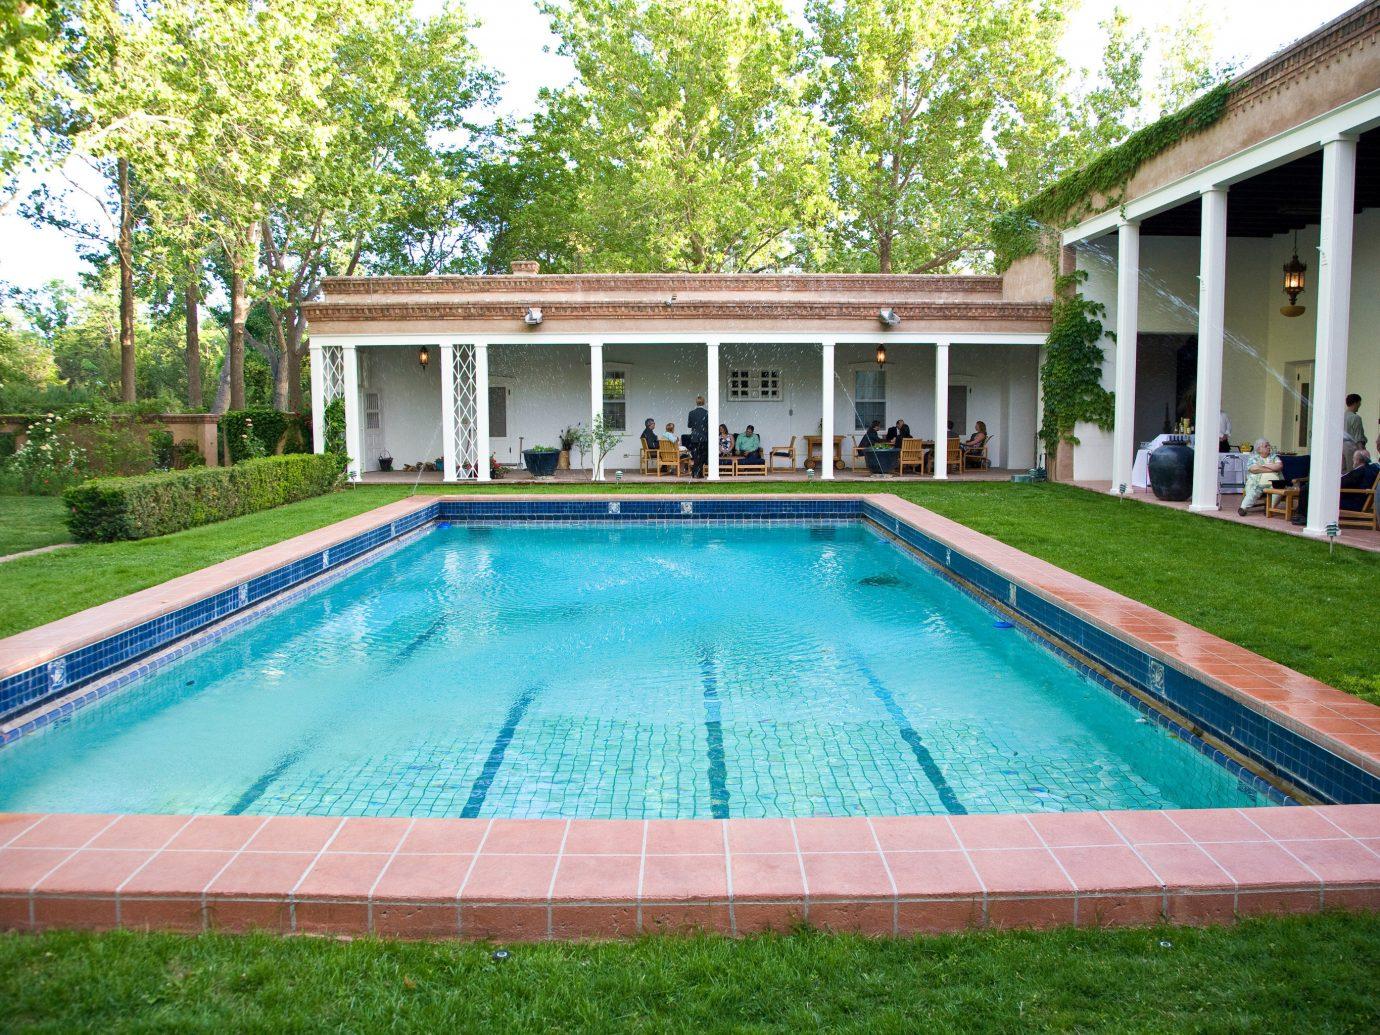 Hotels outdoor building tree grass swimming pool Pool property leisure estate backyard Villa real estate lawn mansion Resort blue Garden